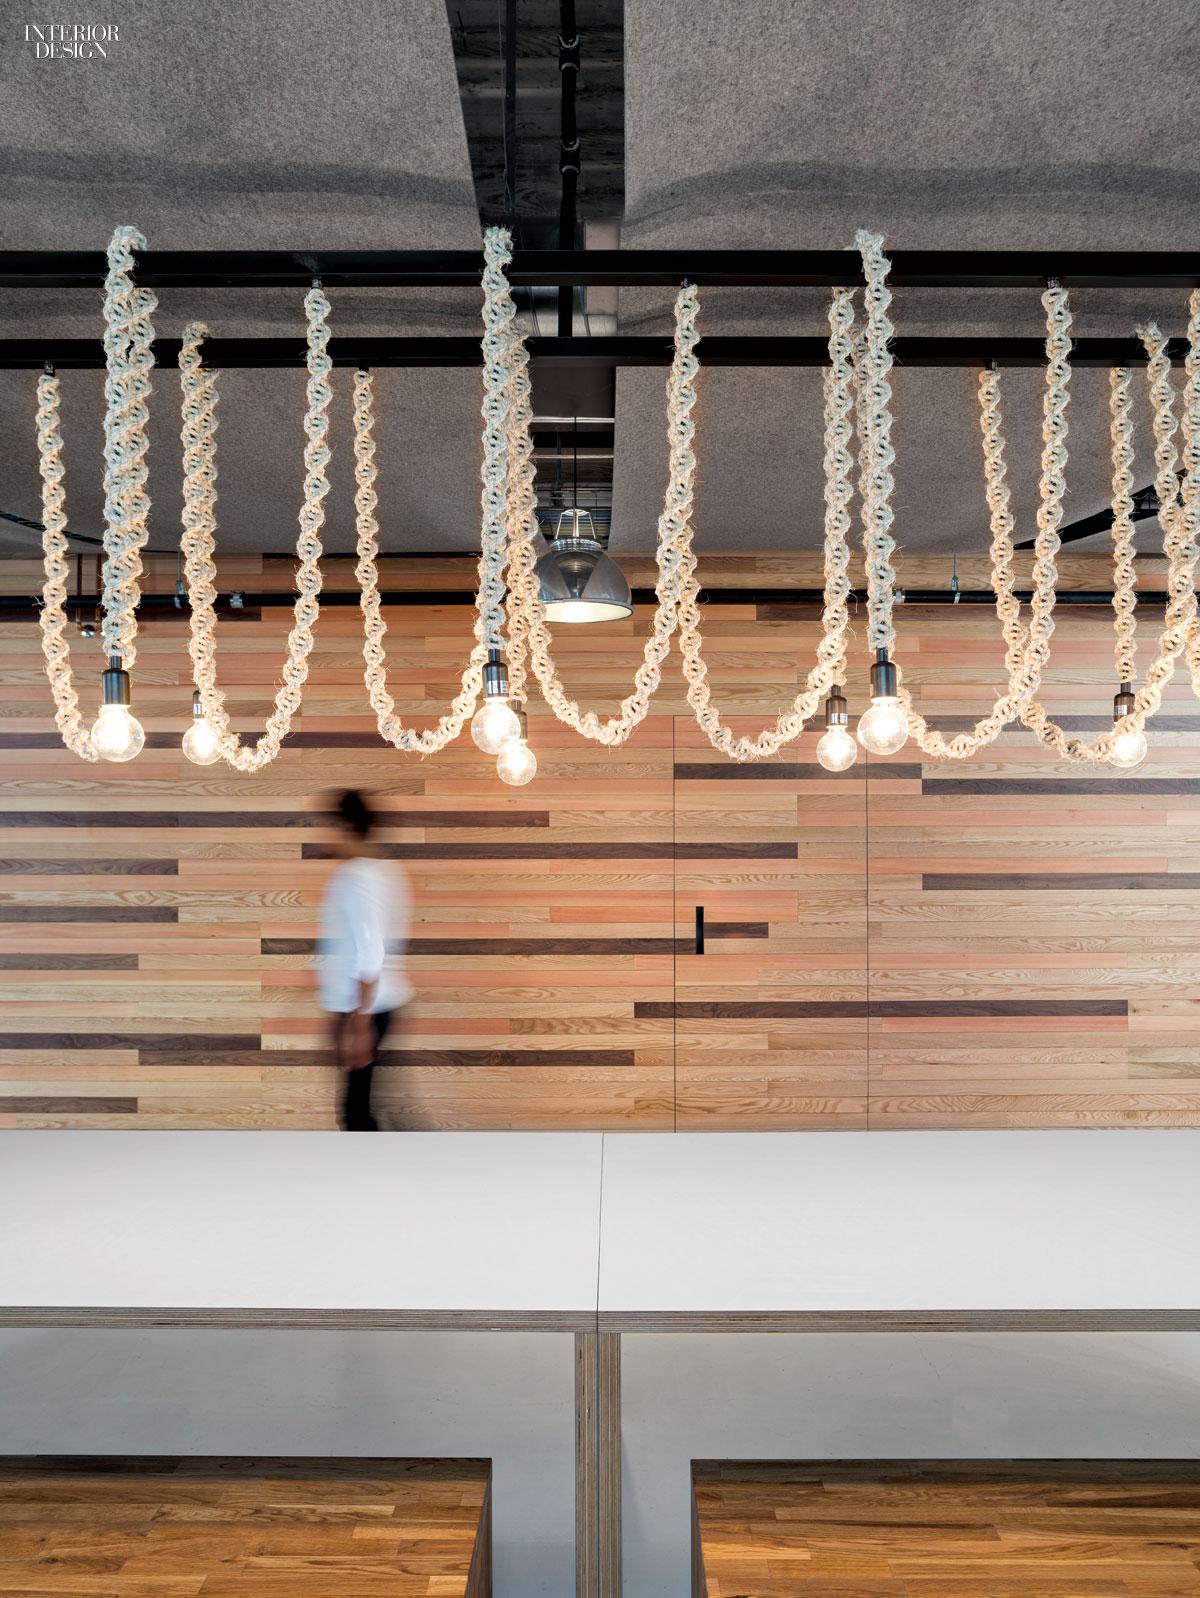 2014 Boy Winner Office Cafe Cafeteria Interior Design Magazine